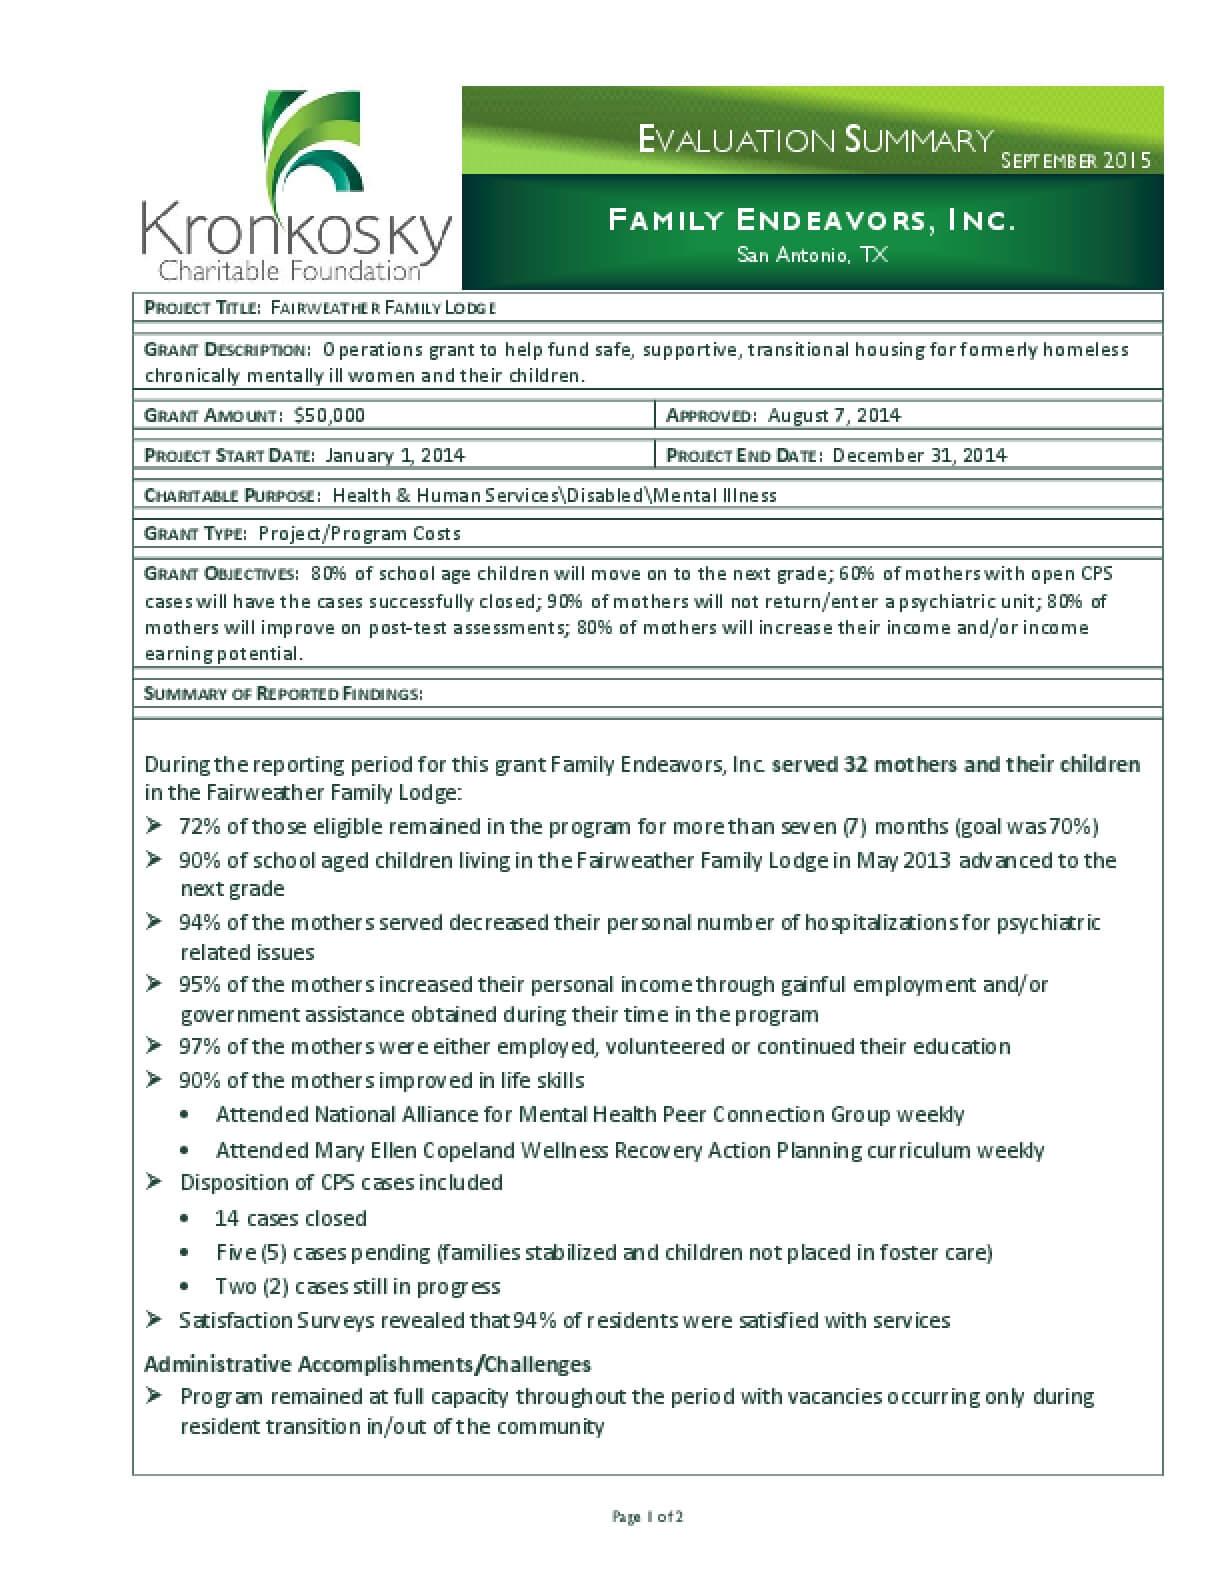 Family Endeavors, Inc. Evaluation Summary